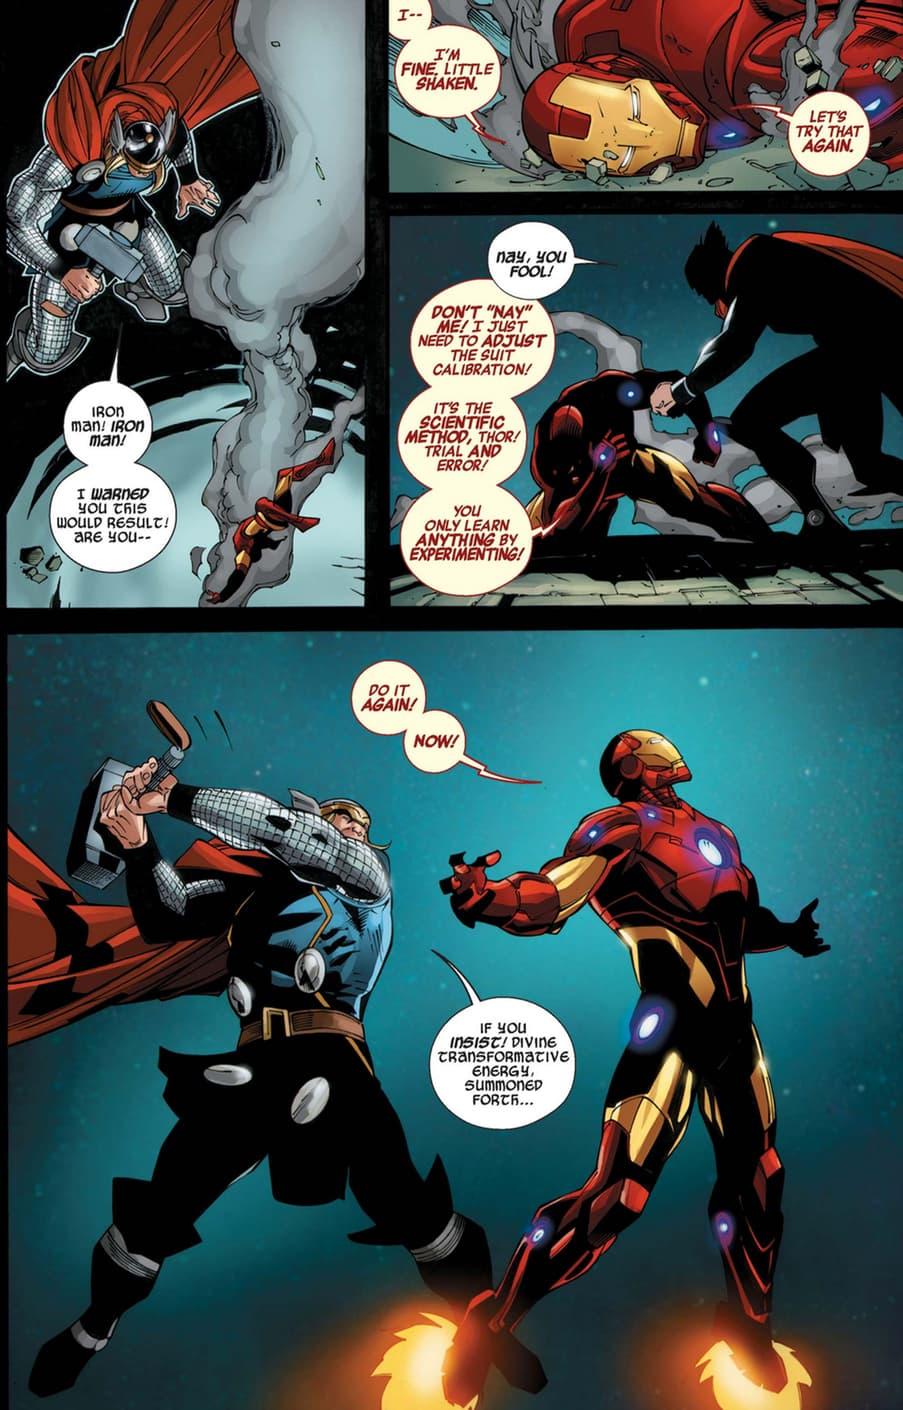 Iron Man and Thor